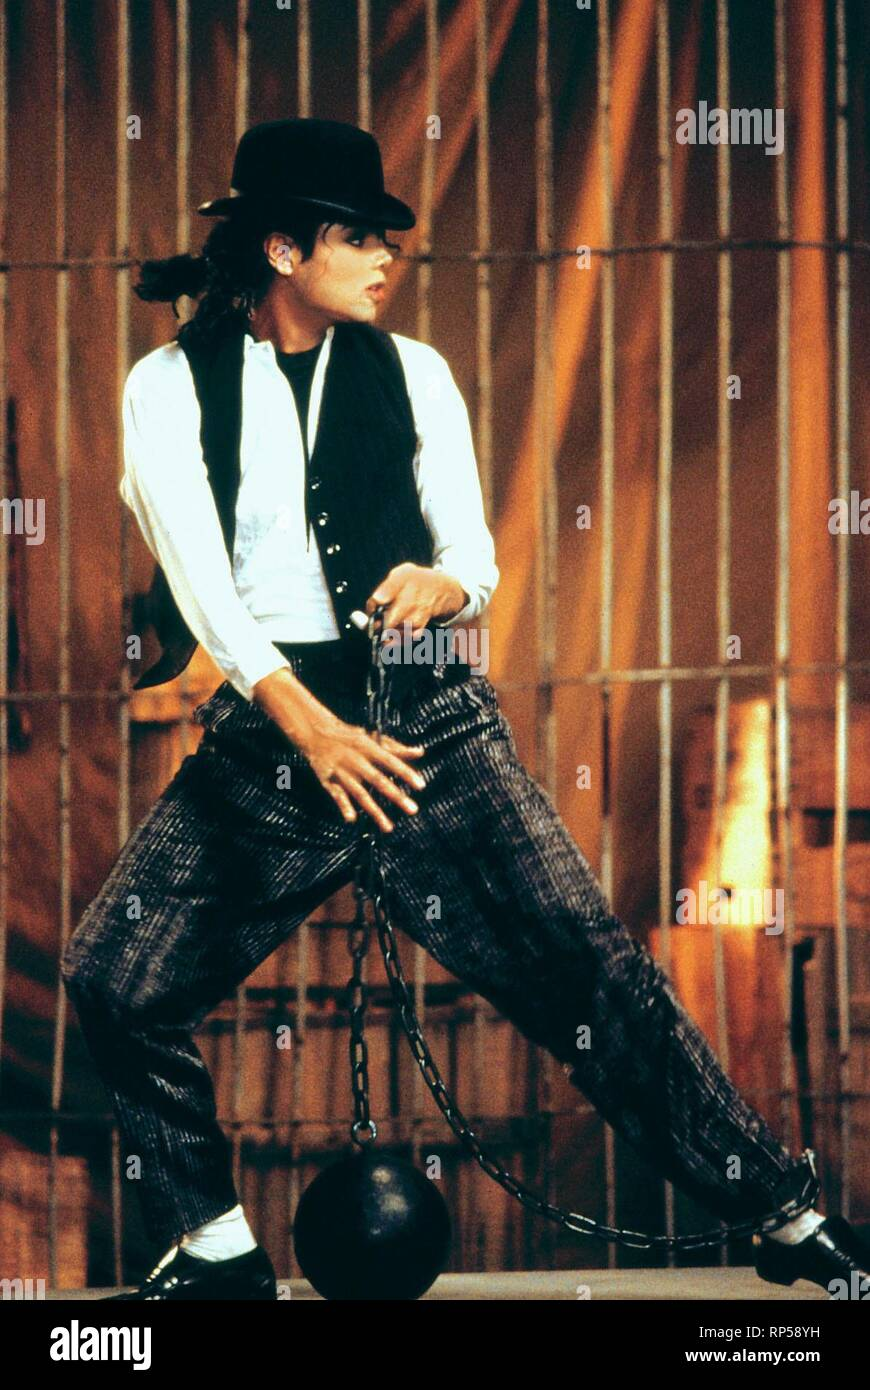 MICHAEL JACKSON, MOONWALKER, 1988 Stock Photo